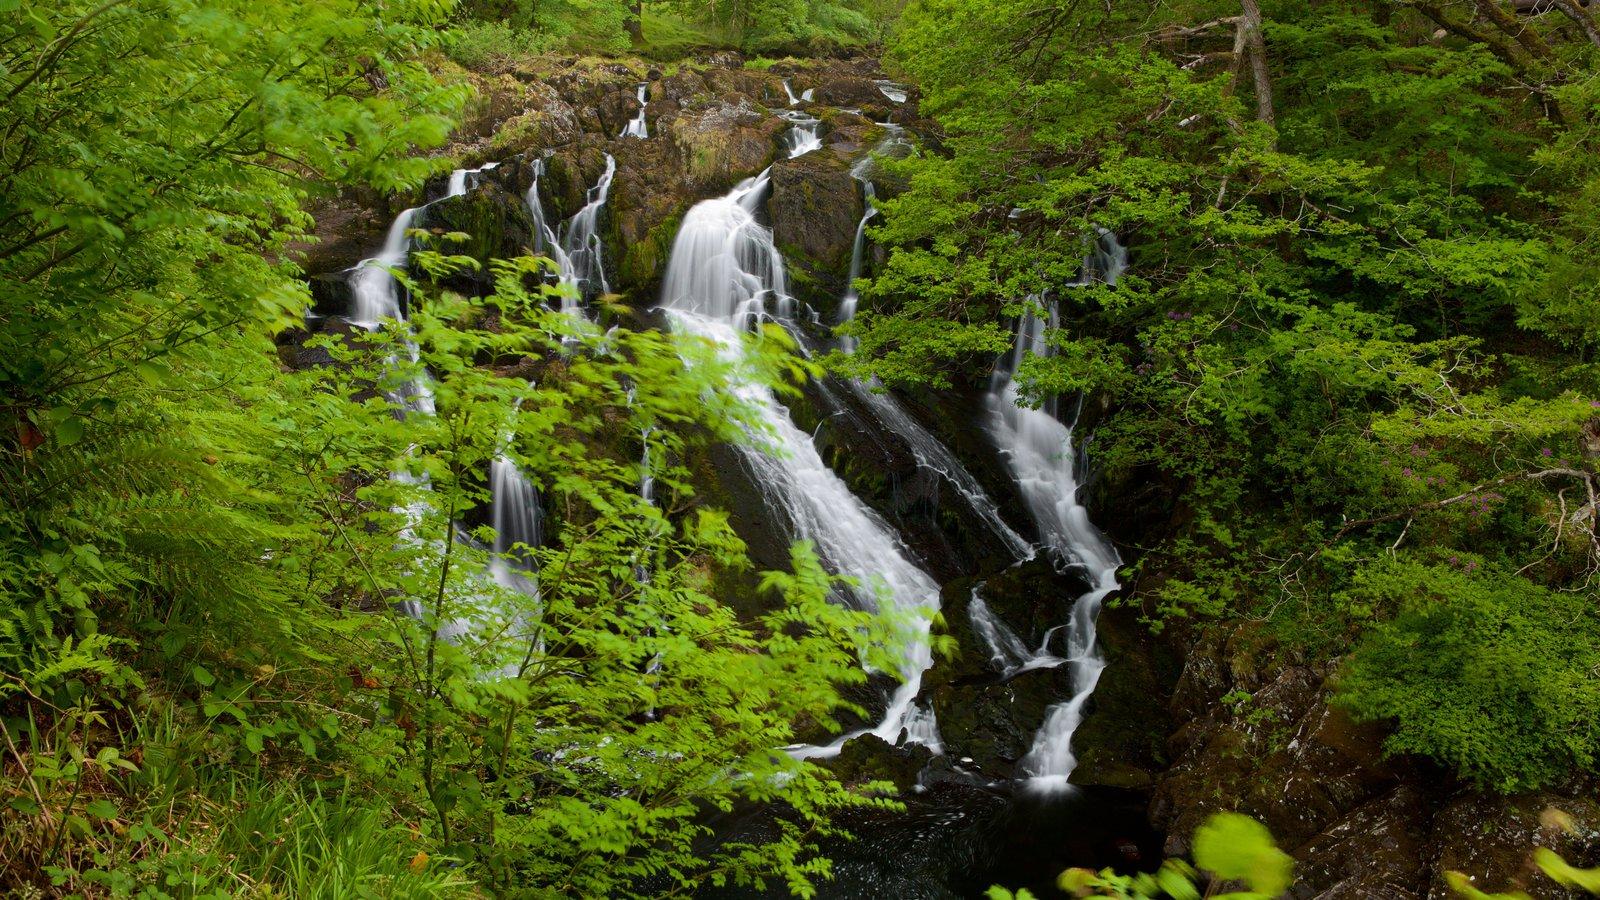 Swallow Falls ofreciendo selva y una catarata